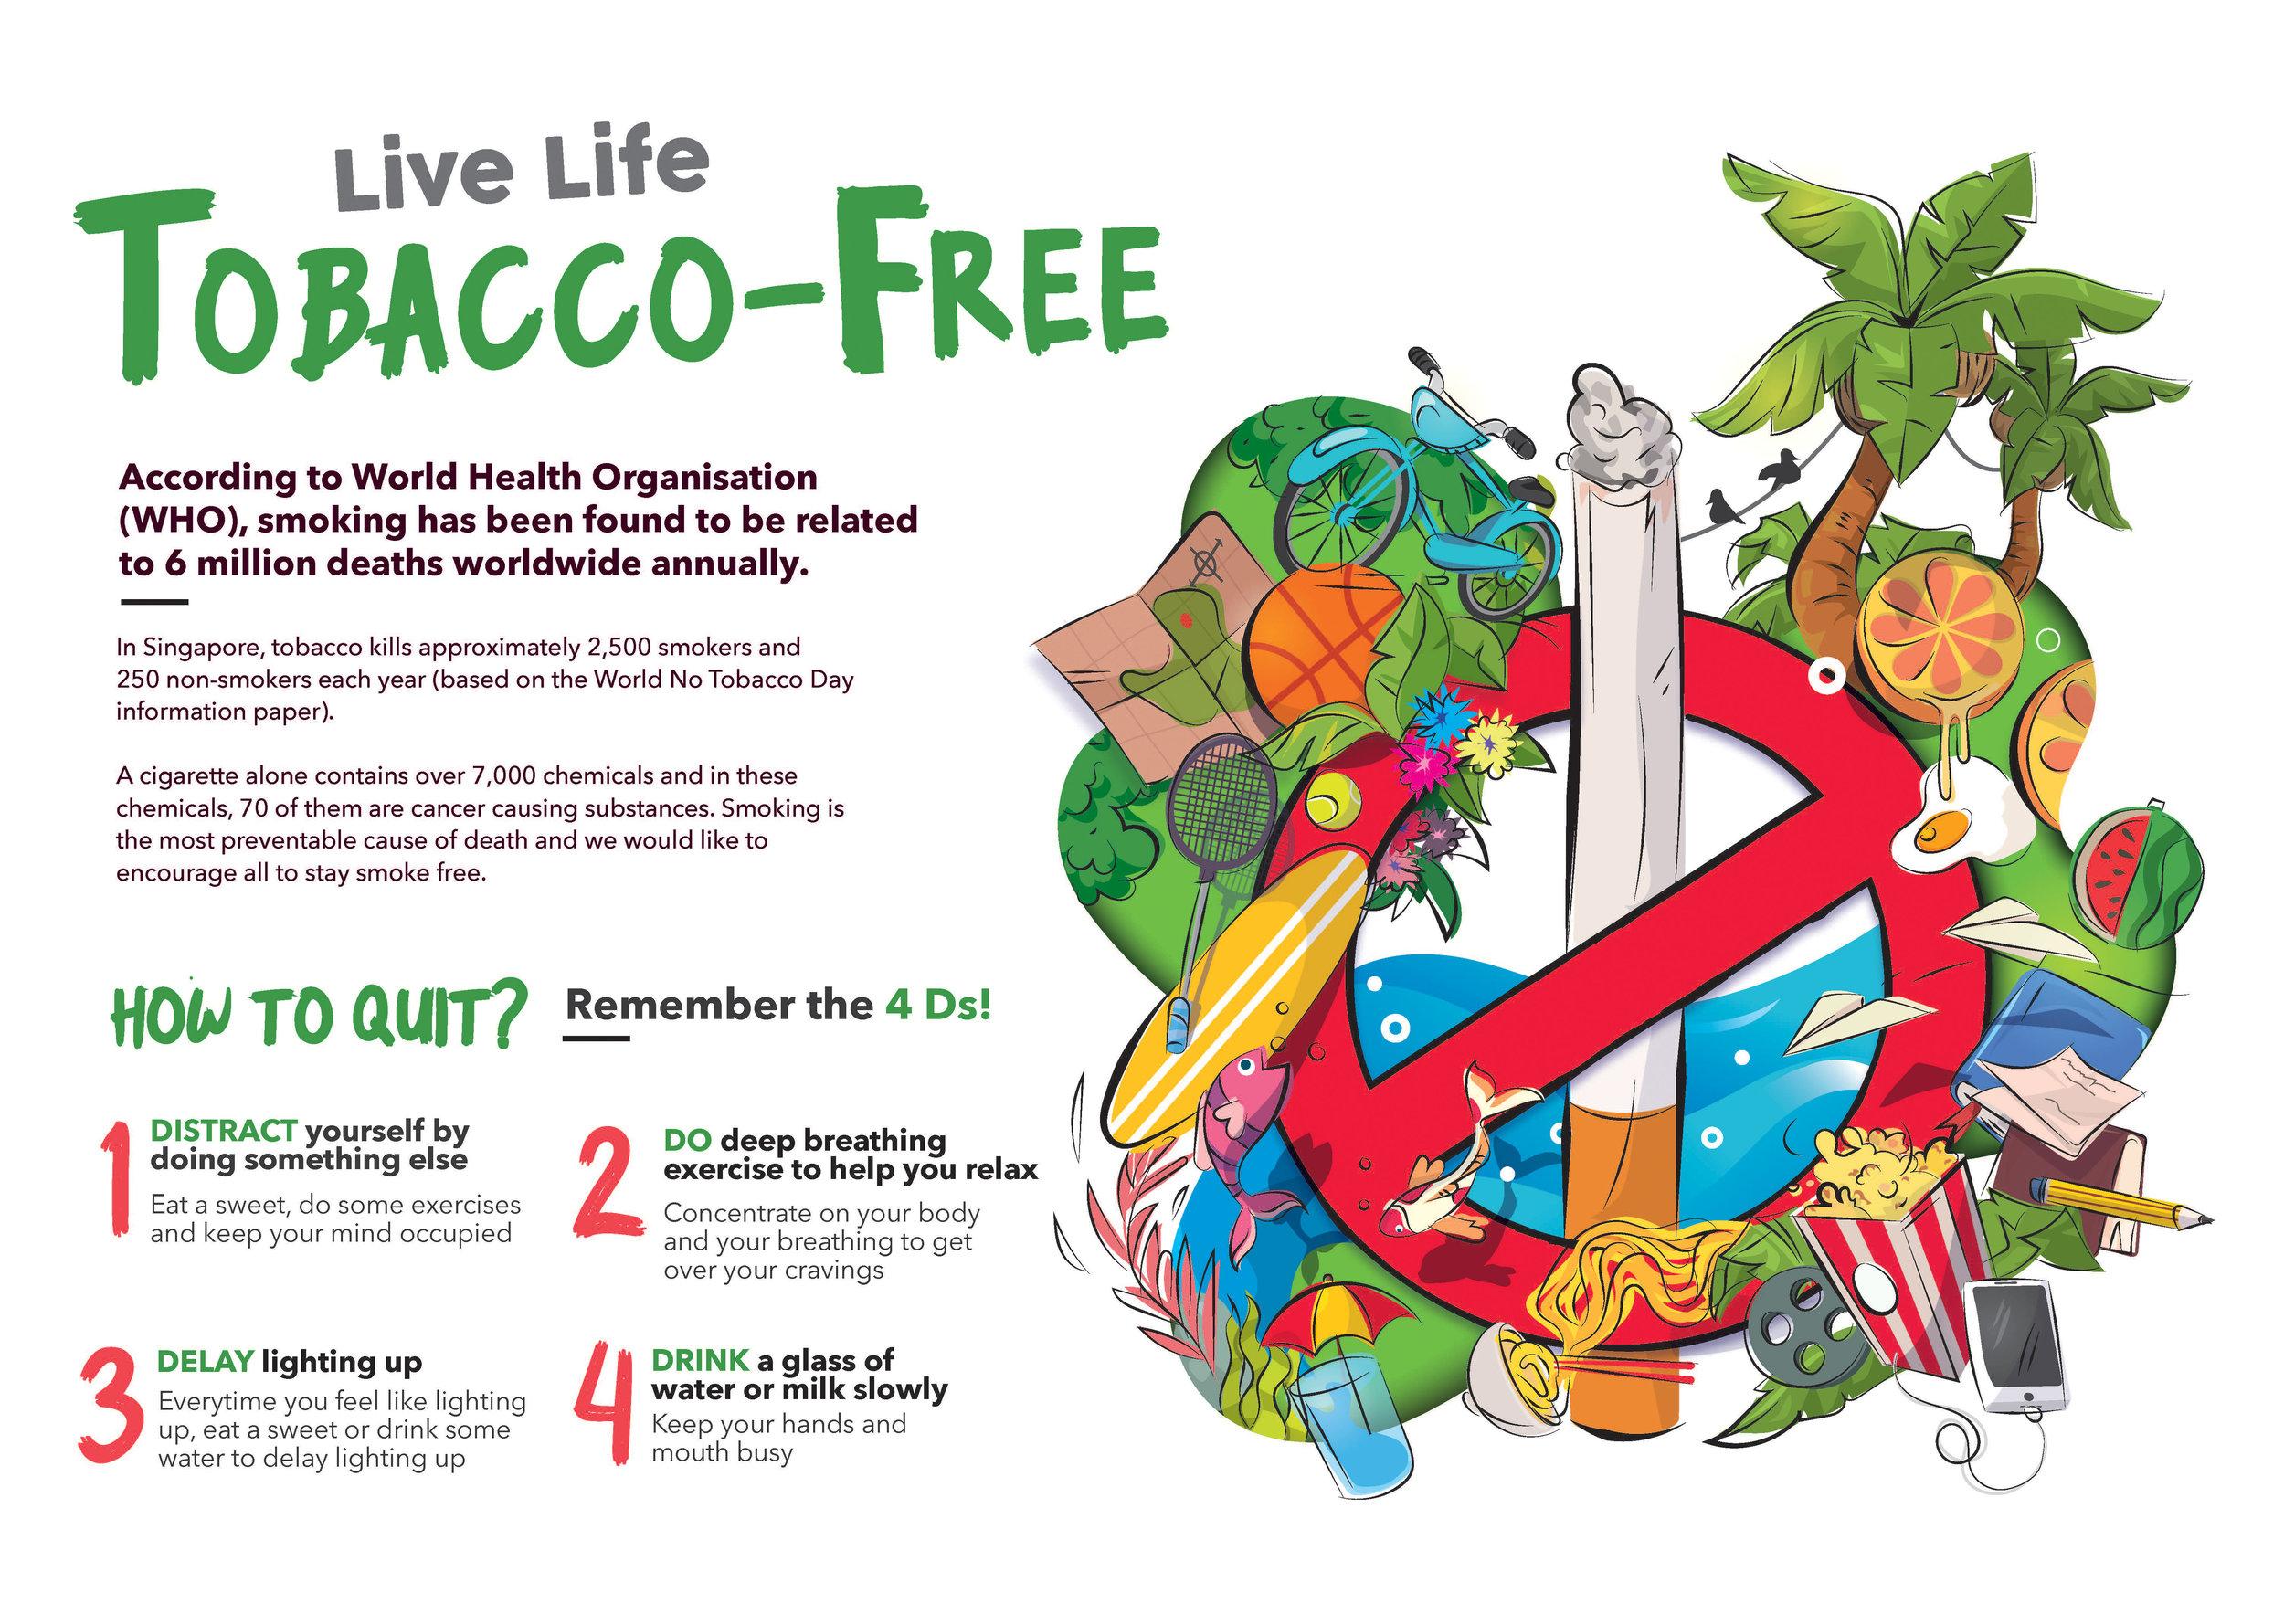 Live Life Tobacco-Free 2